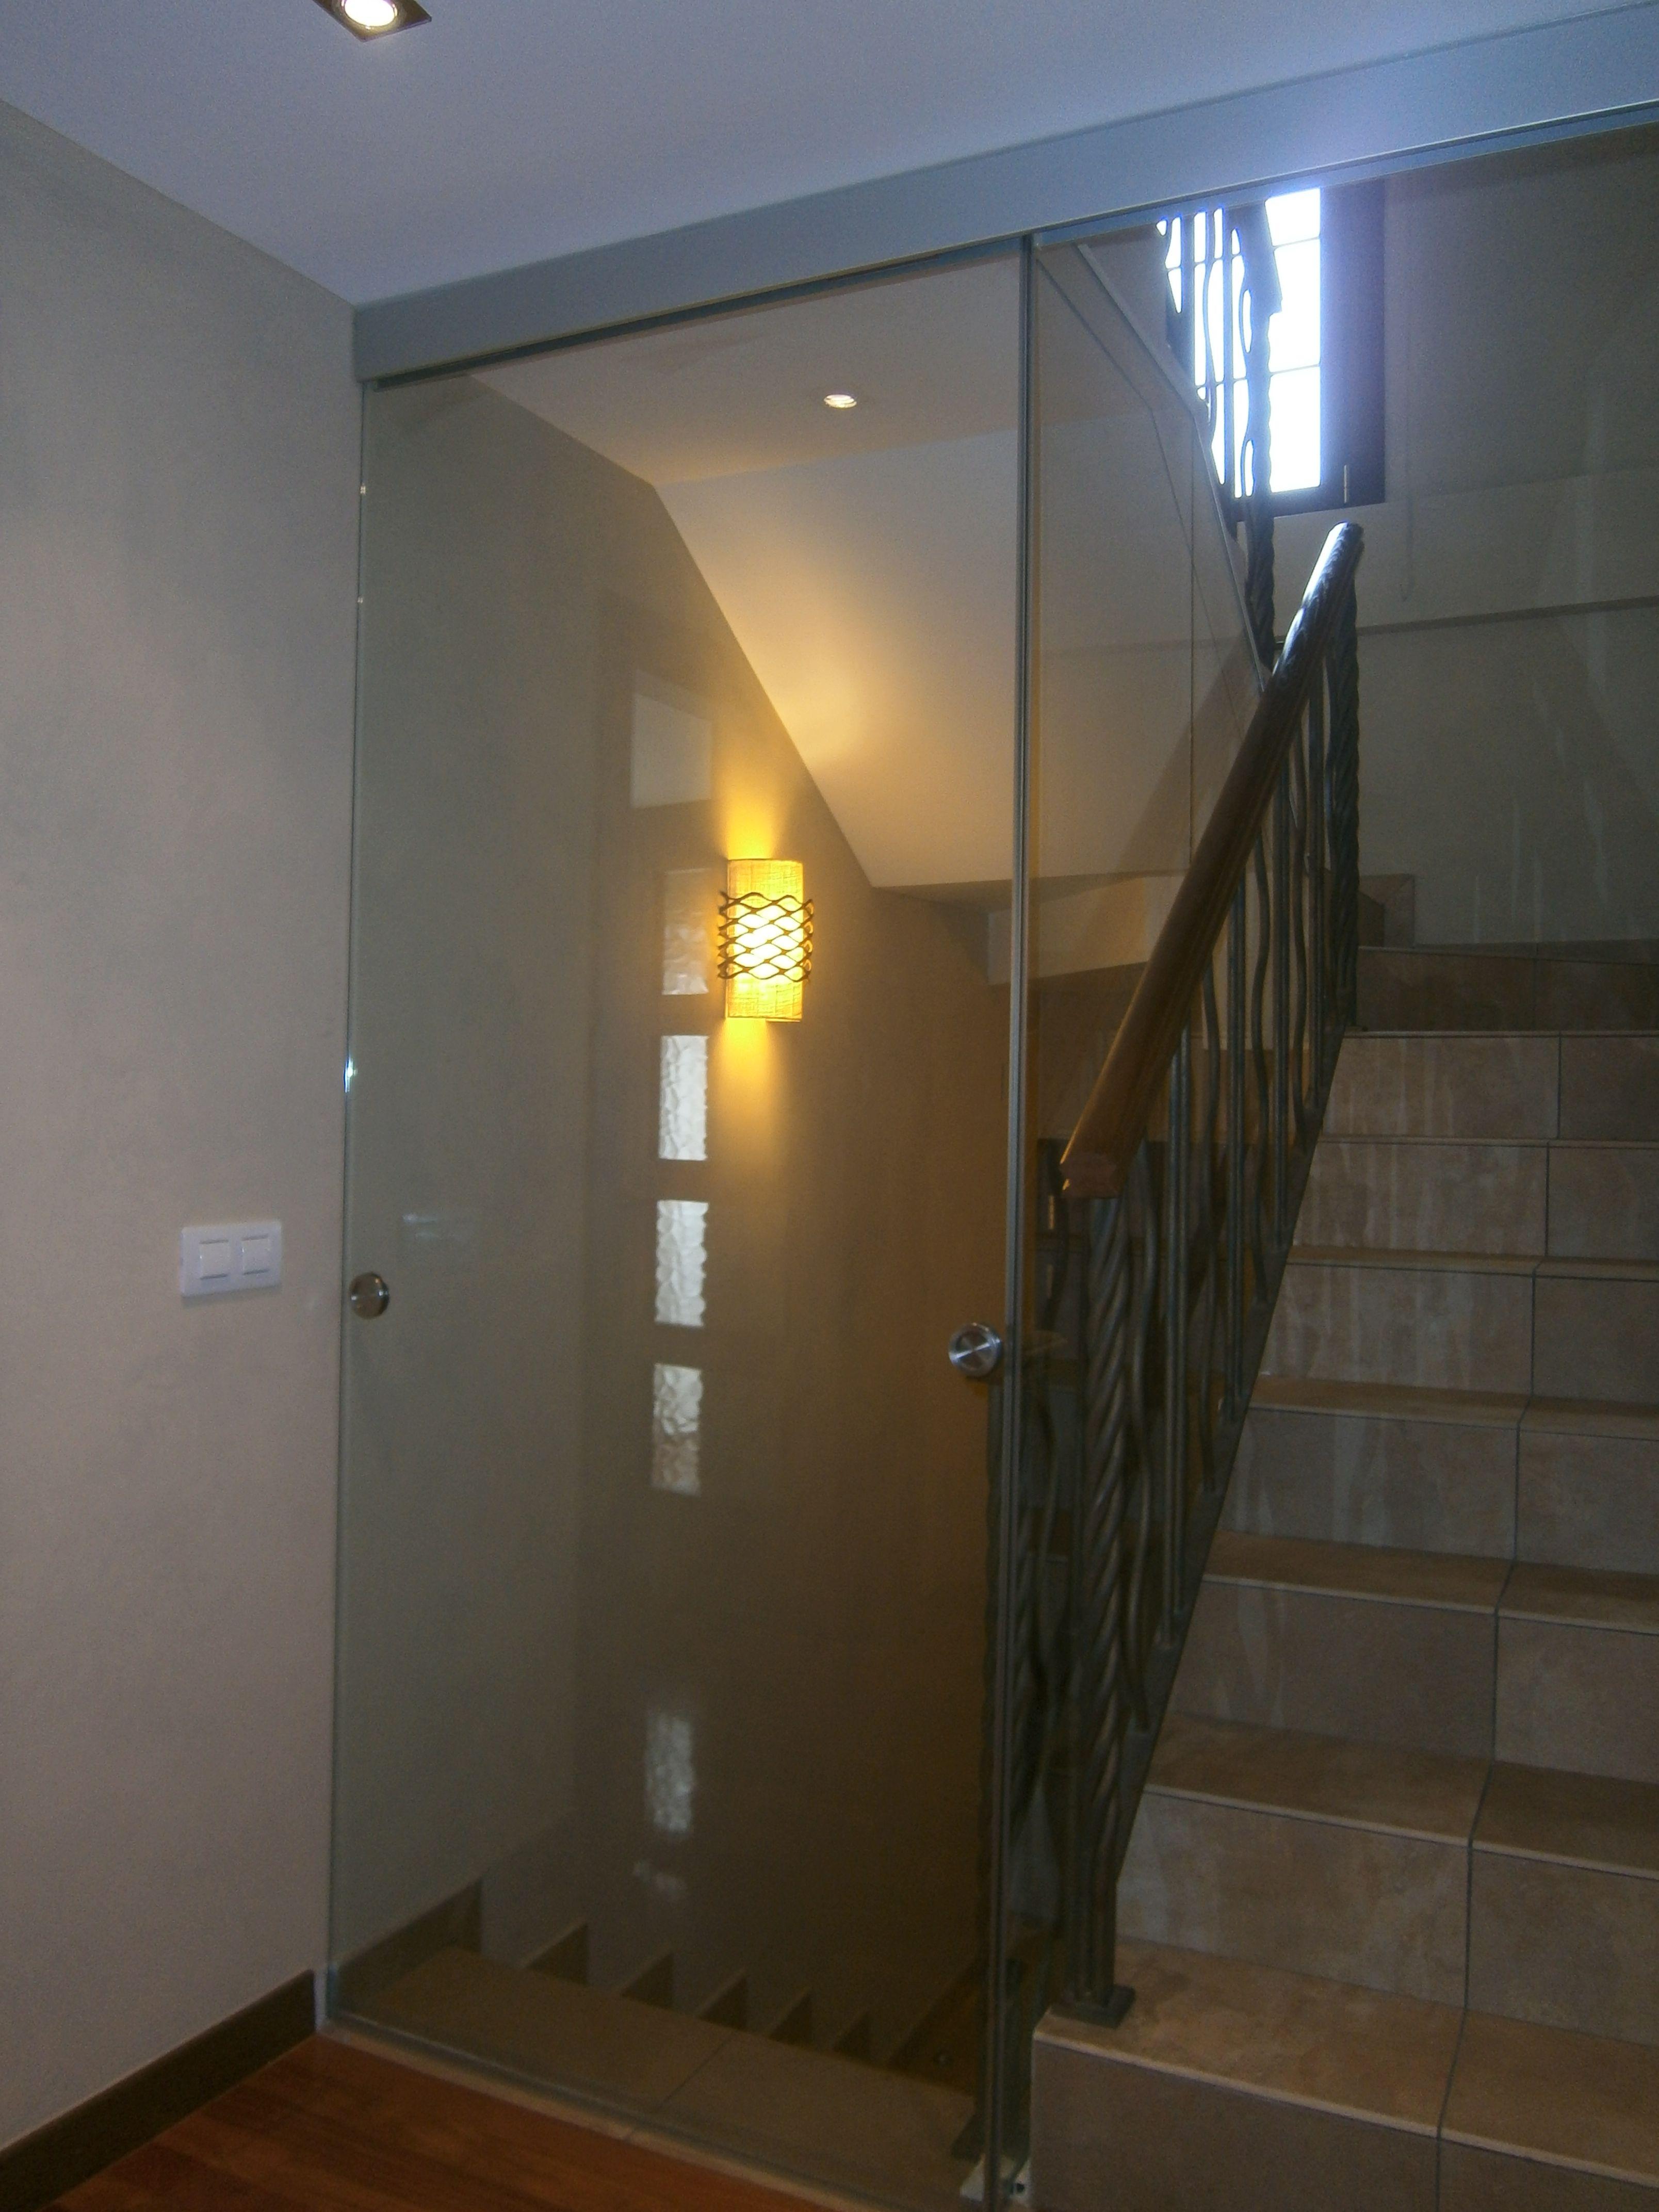 Puerta corredera de cristal para cerrar escalera con una - Puertas corredera de cristal ...